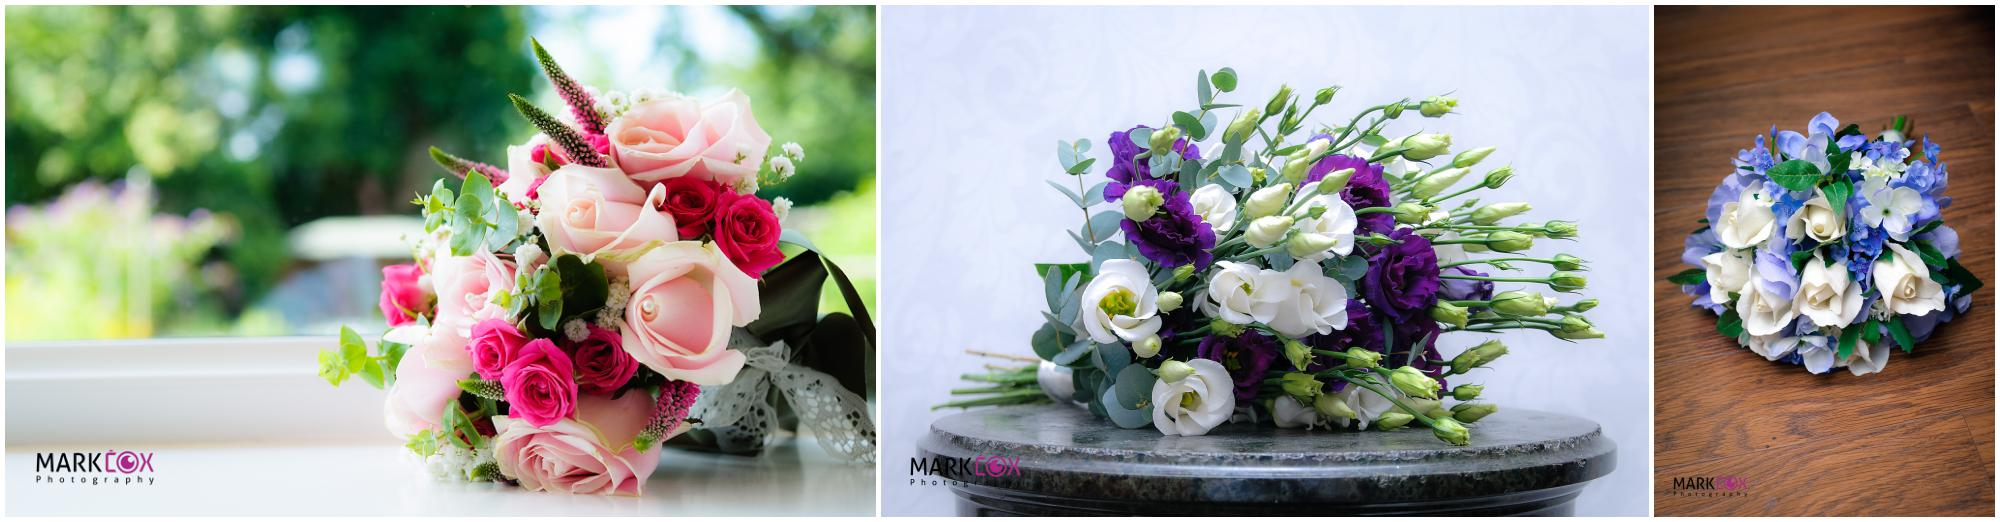 British Flowers Week - Taunton Wedding Photographer-003